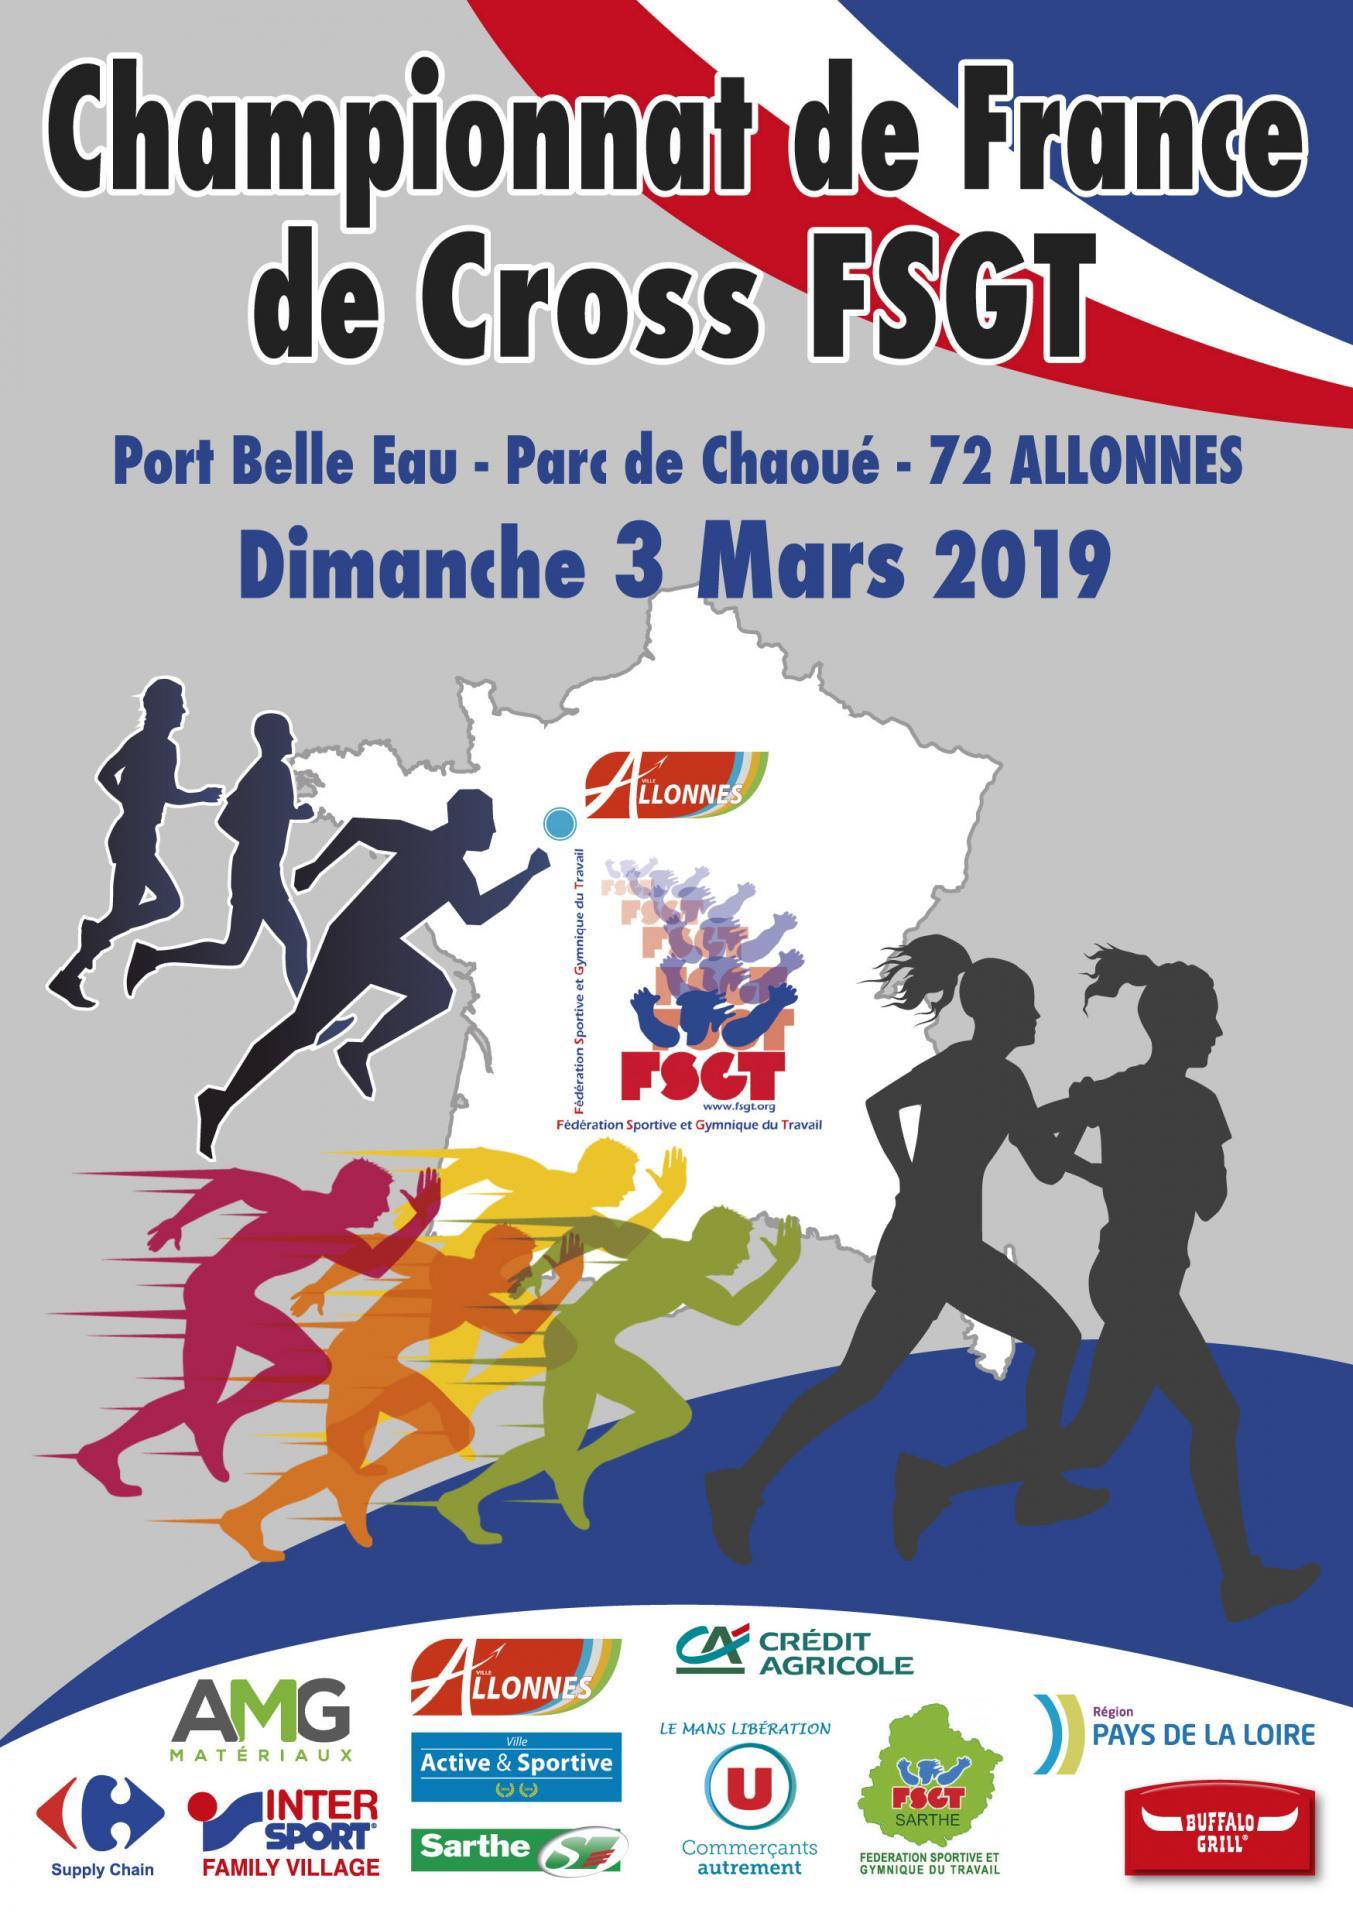 Championnat de France de cross